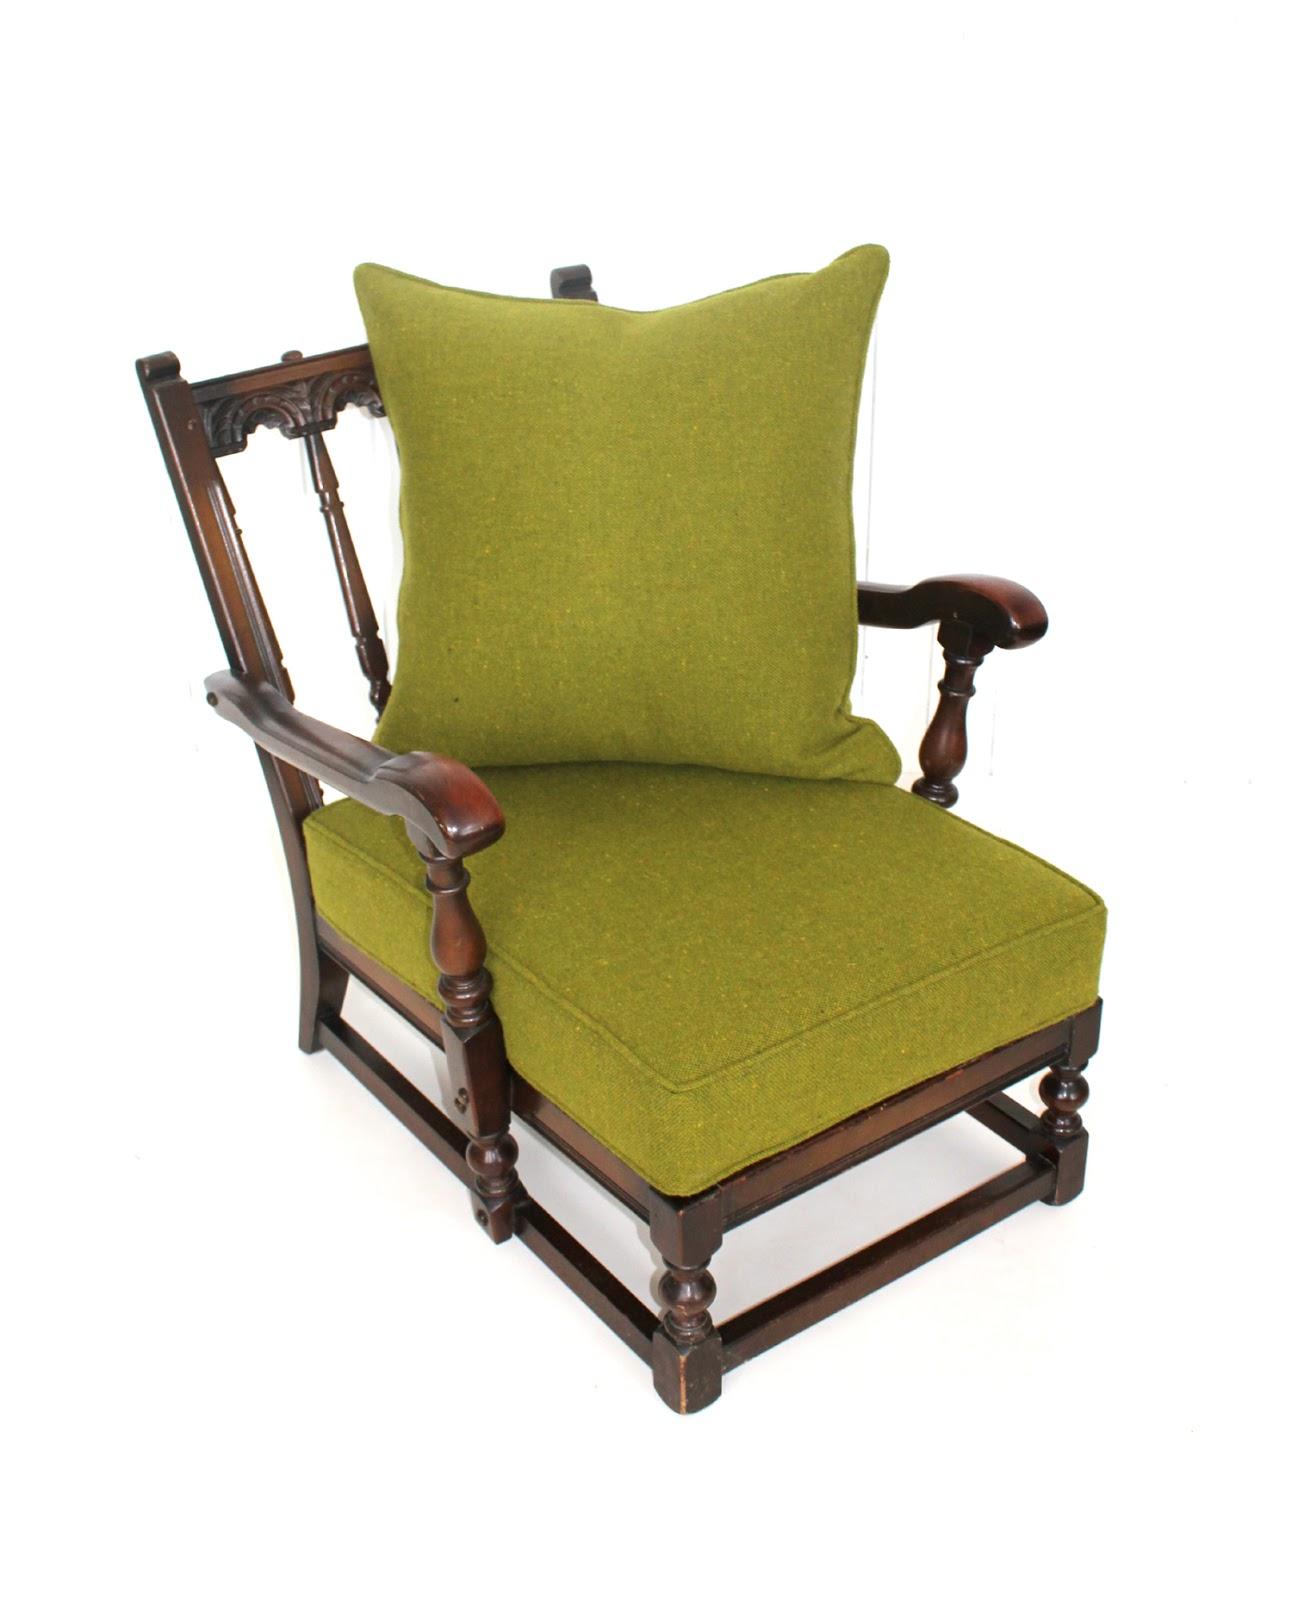 Mick Sheridan Upholstery Ercol Old Colonial Suite in Bute tweed